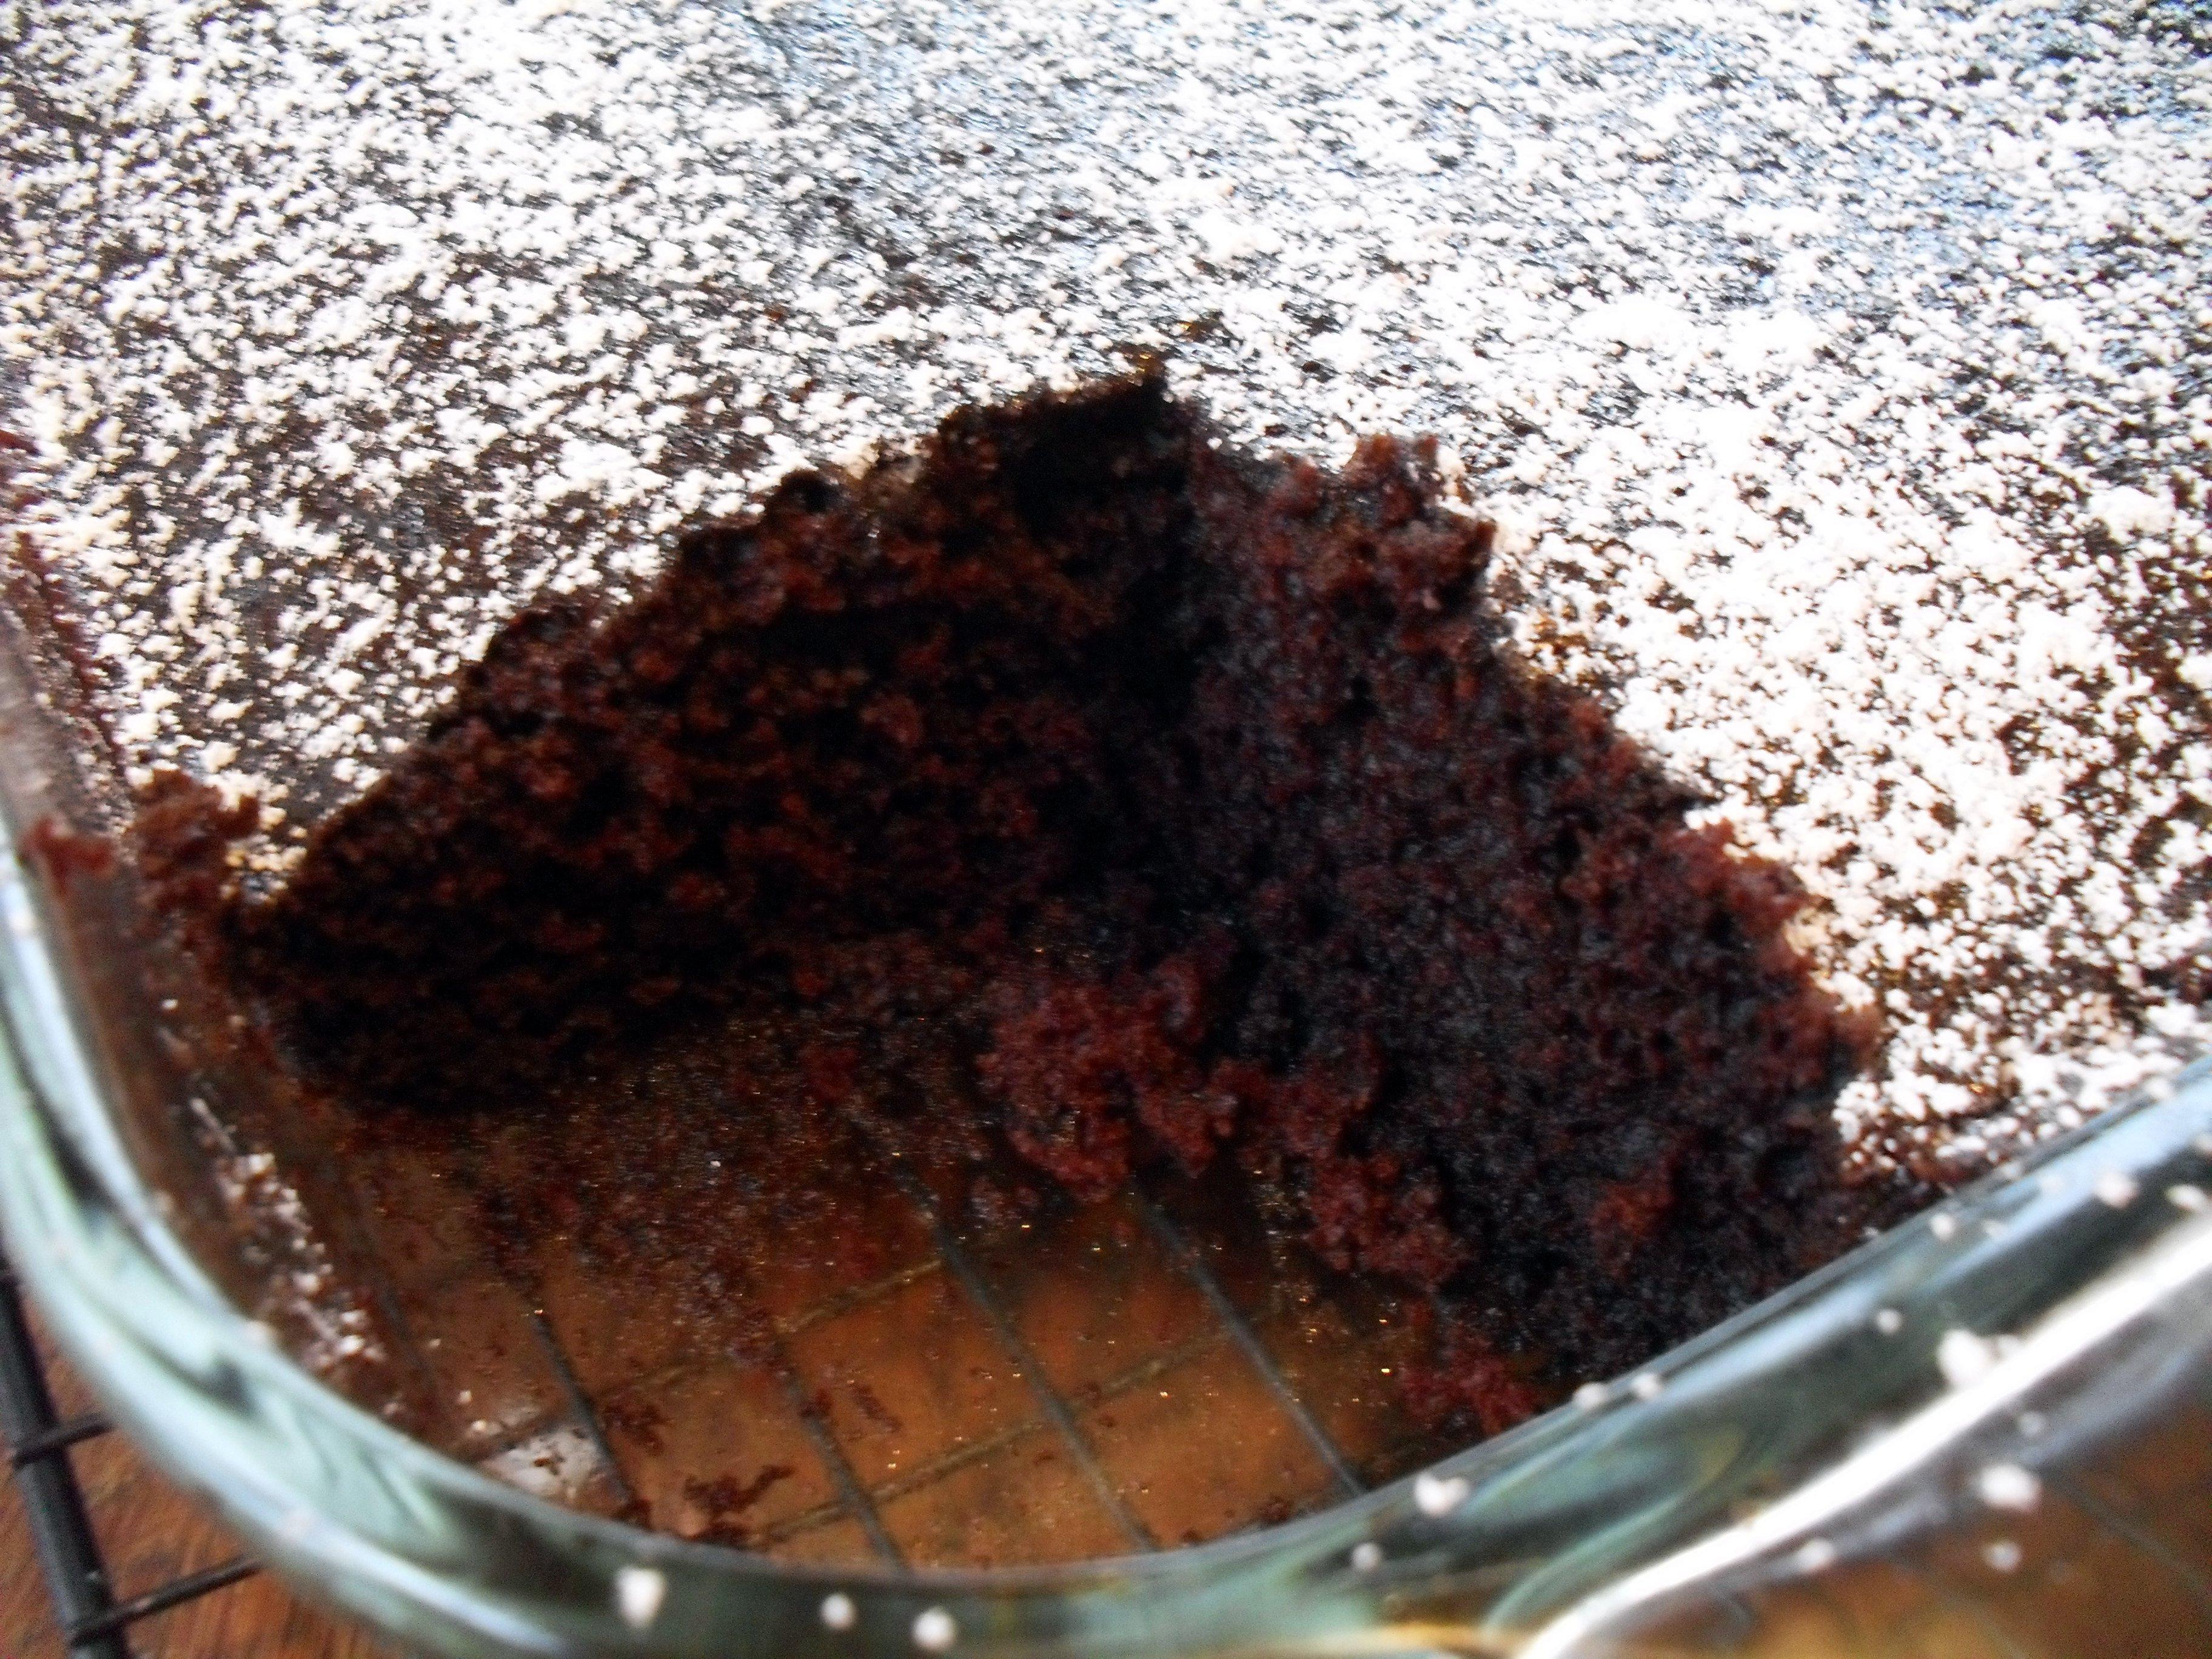 ... mocha wacky cake natural and free mocha wacky wacky cake of wacky cake